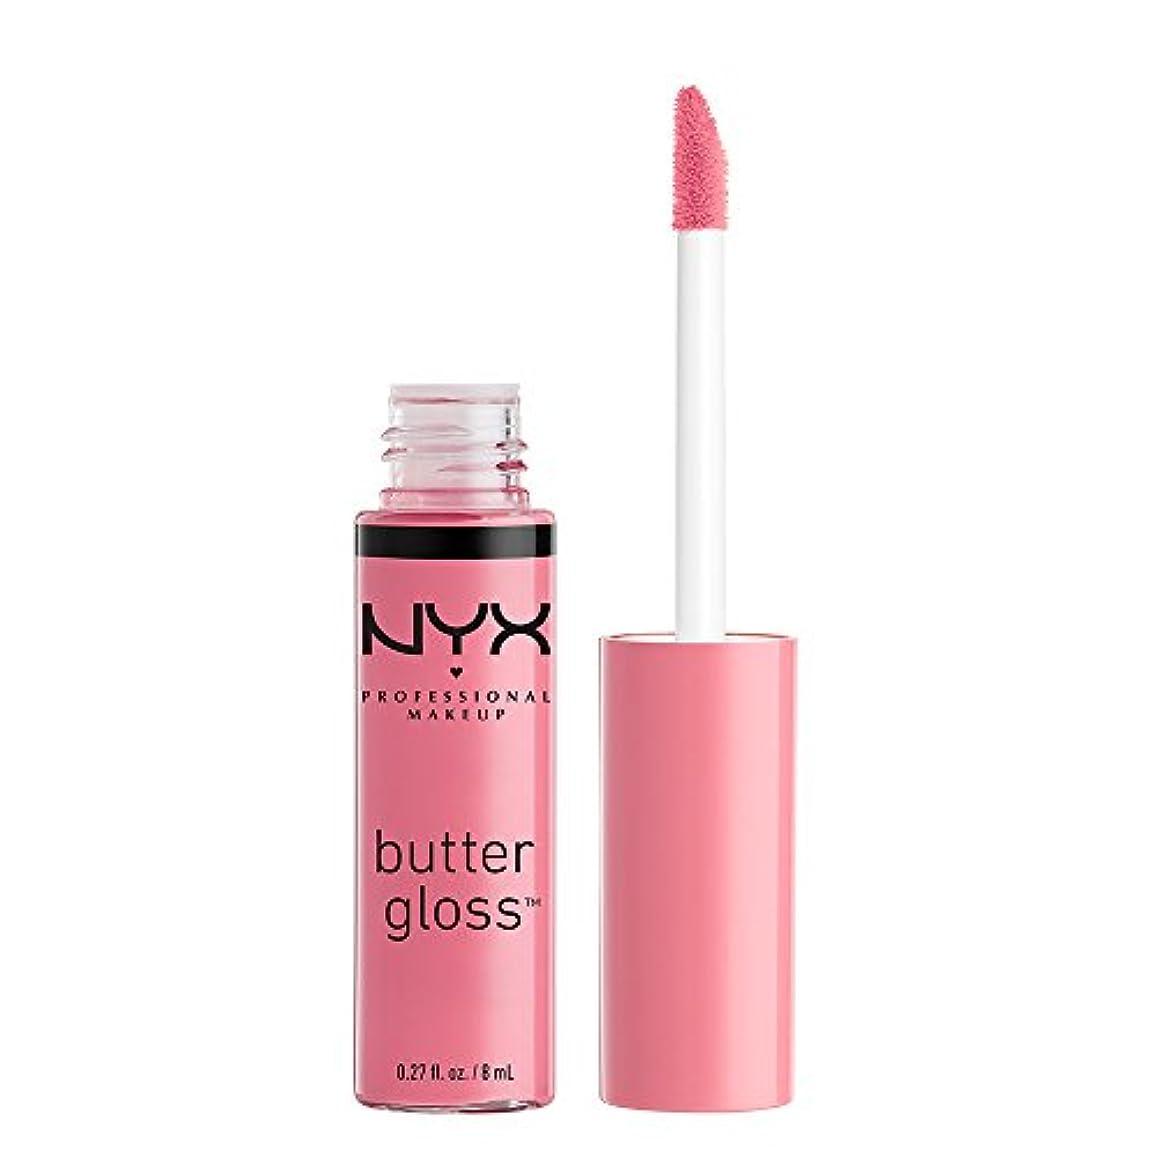 NYX(ニックス) バター グロス 09 カラー?バニラ クリームパイ リップ